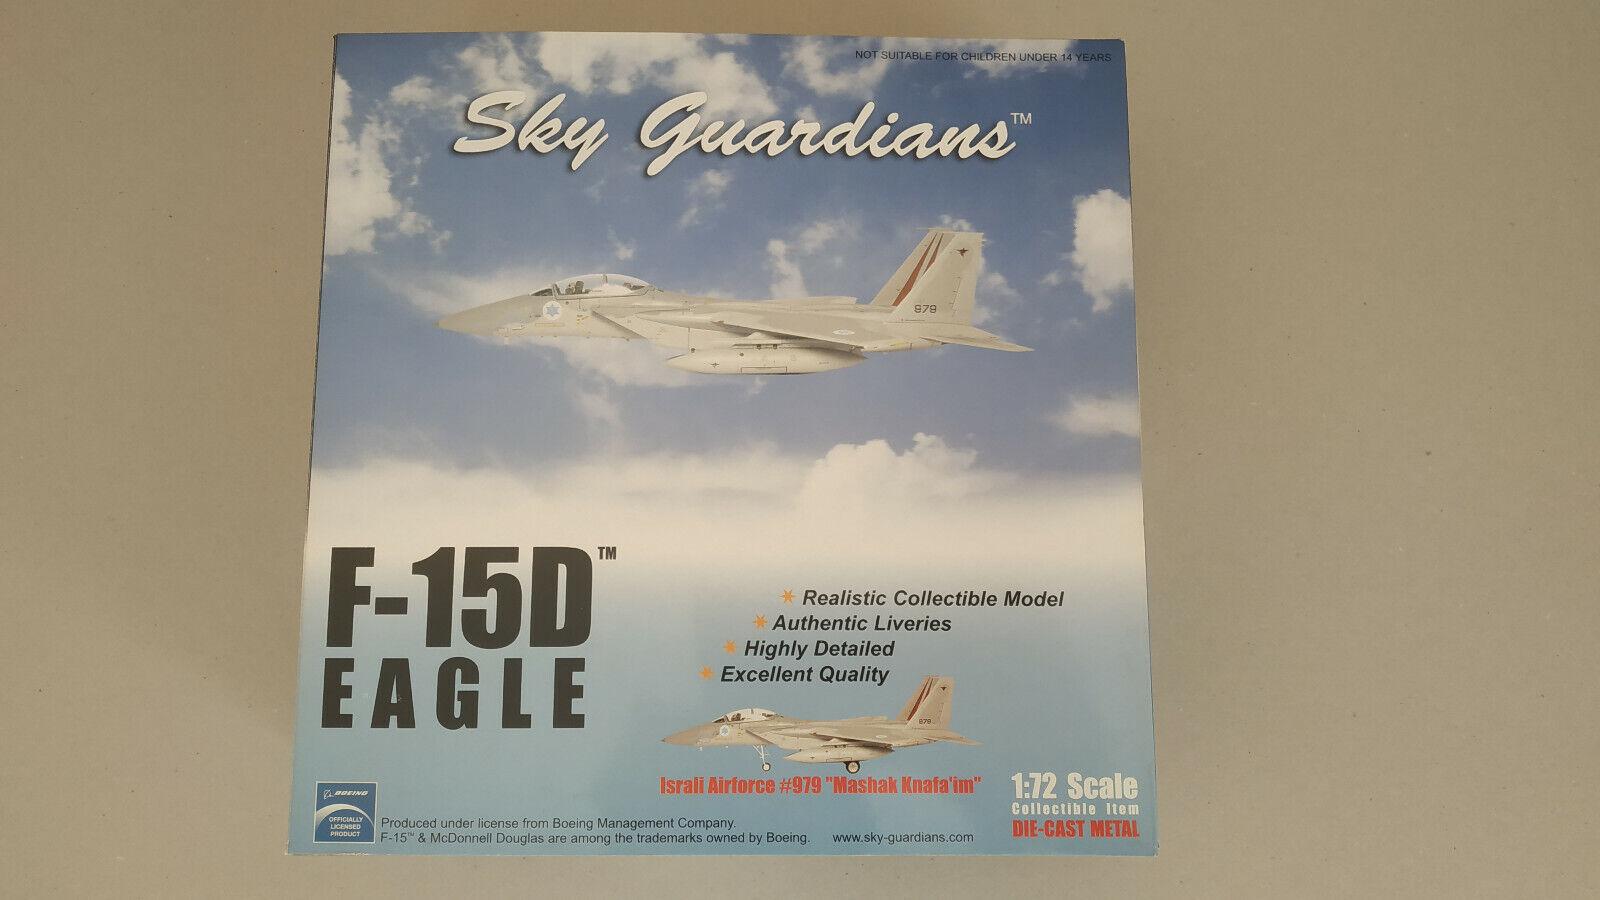 SKY GUARDIANS F-15D eAngle 1 72 Israeli Air Force 979,  Mashak knafa'im